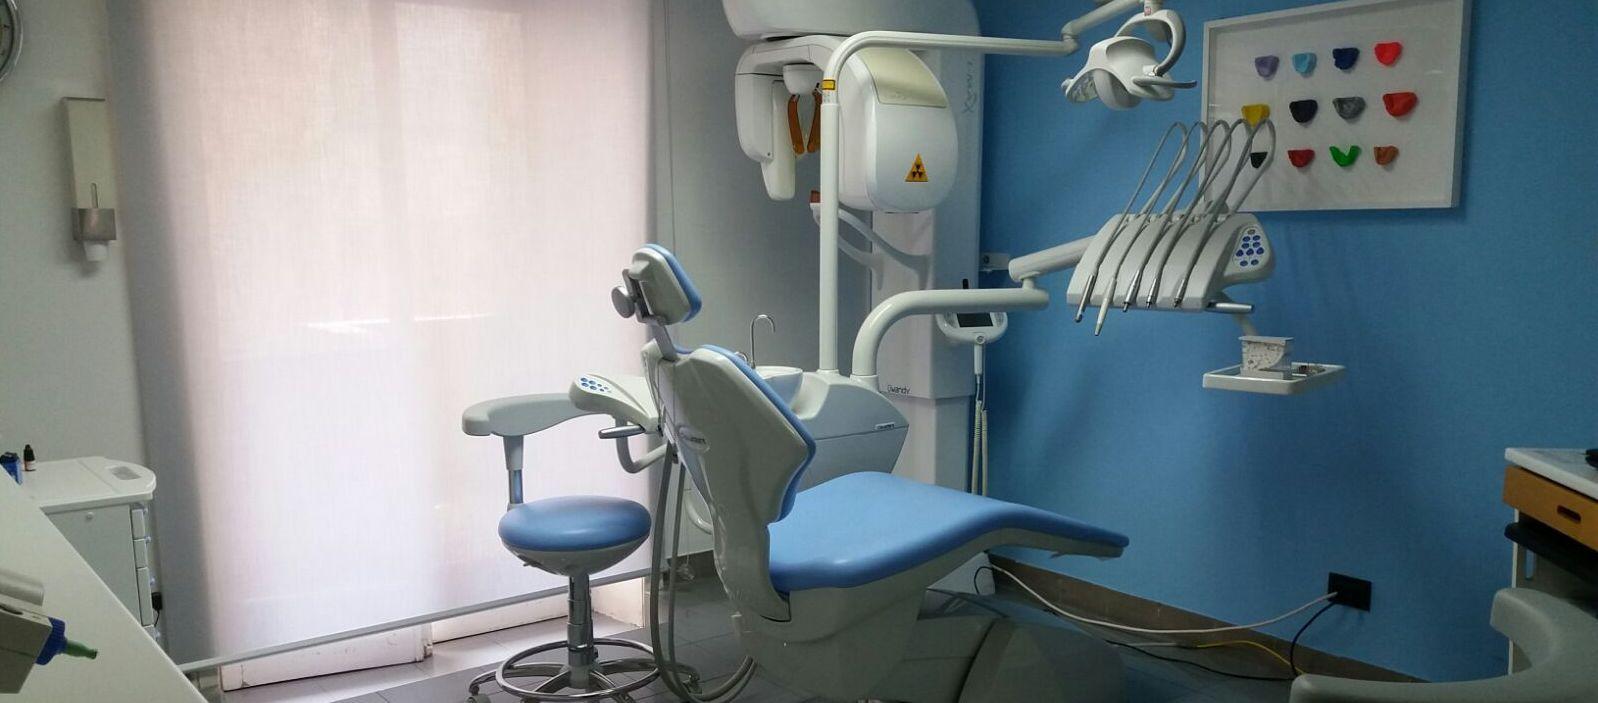 pierluigi petrella dentista milano san donato milanese